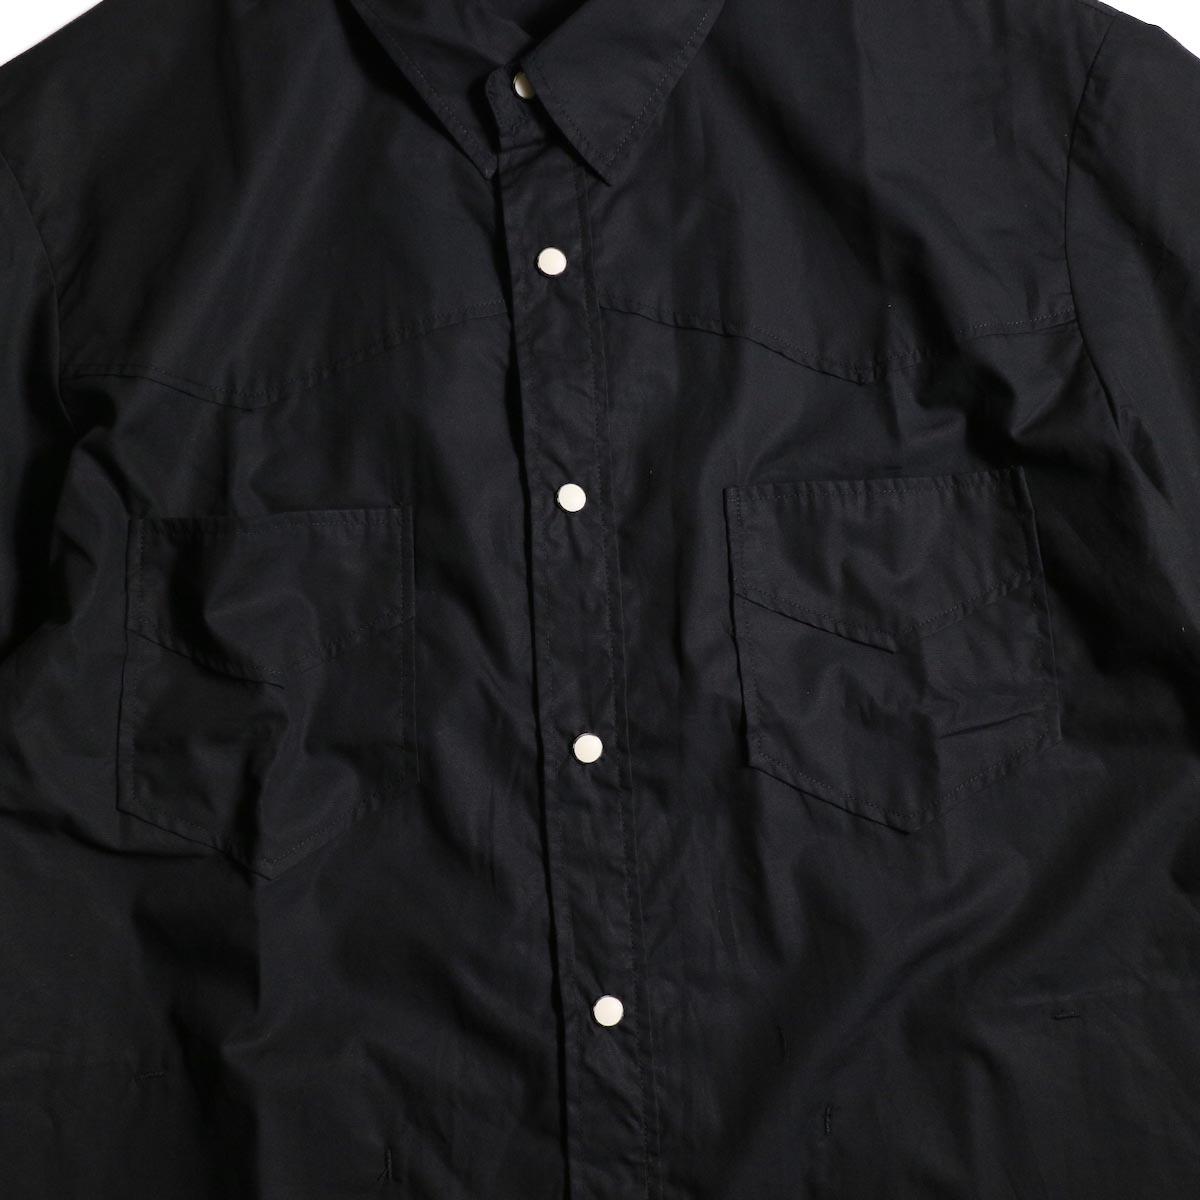 FUTURE PRIMITIVE / FP WESTERN SS SHIRT (Black)胸ポケット